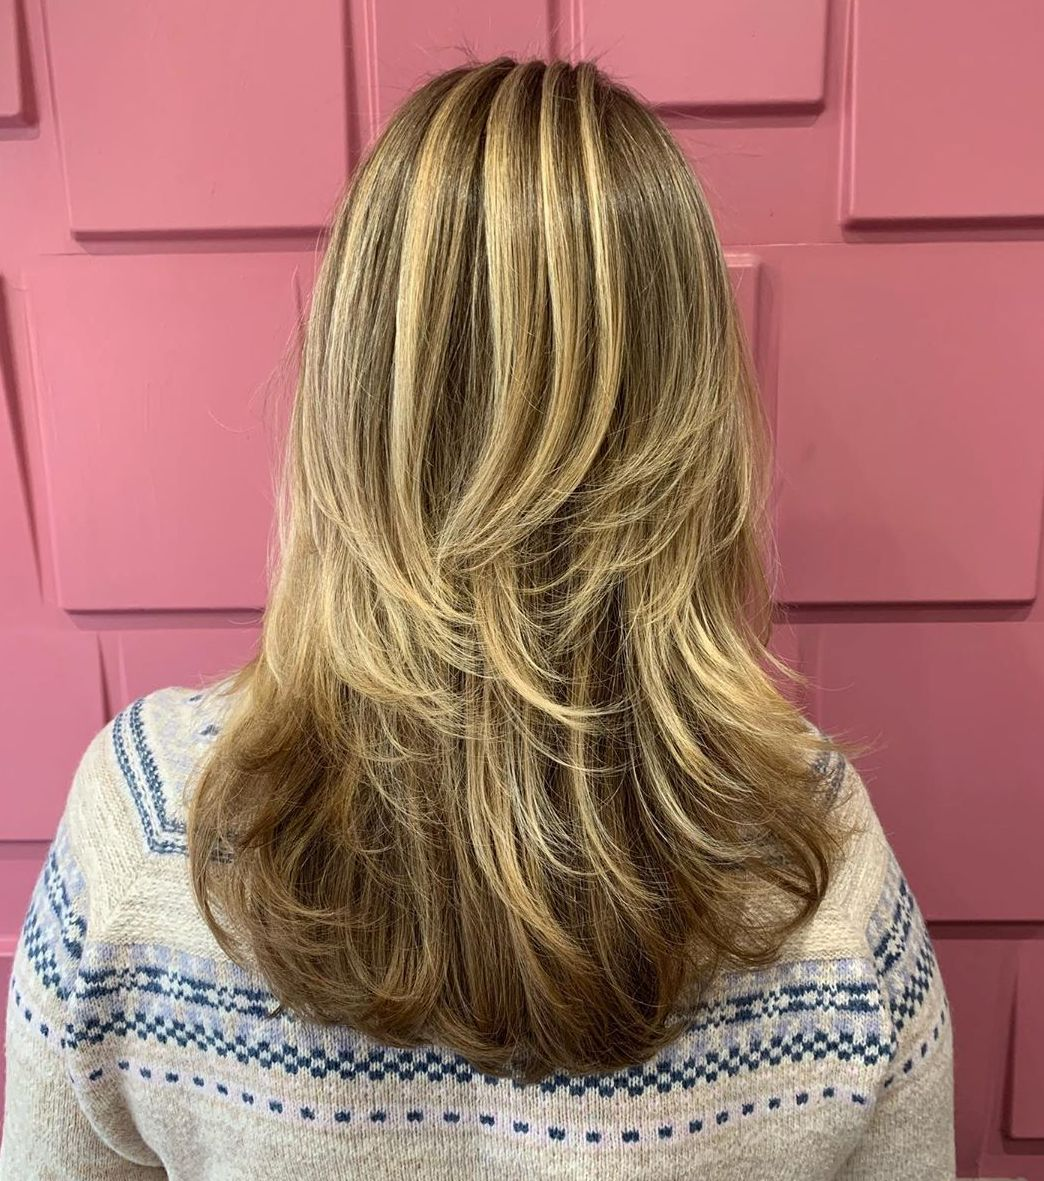 Two-Tier Medium Layered Haircut